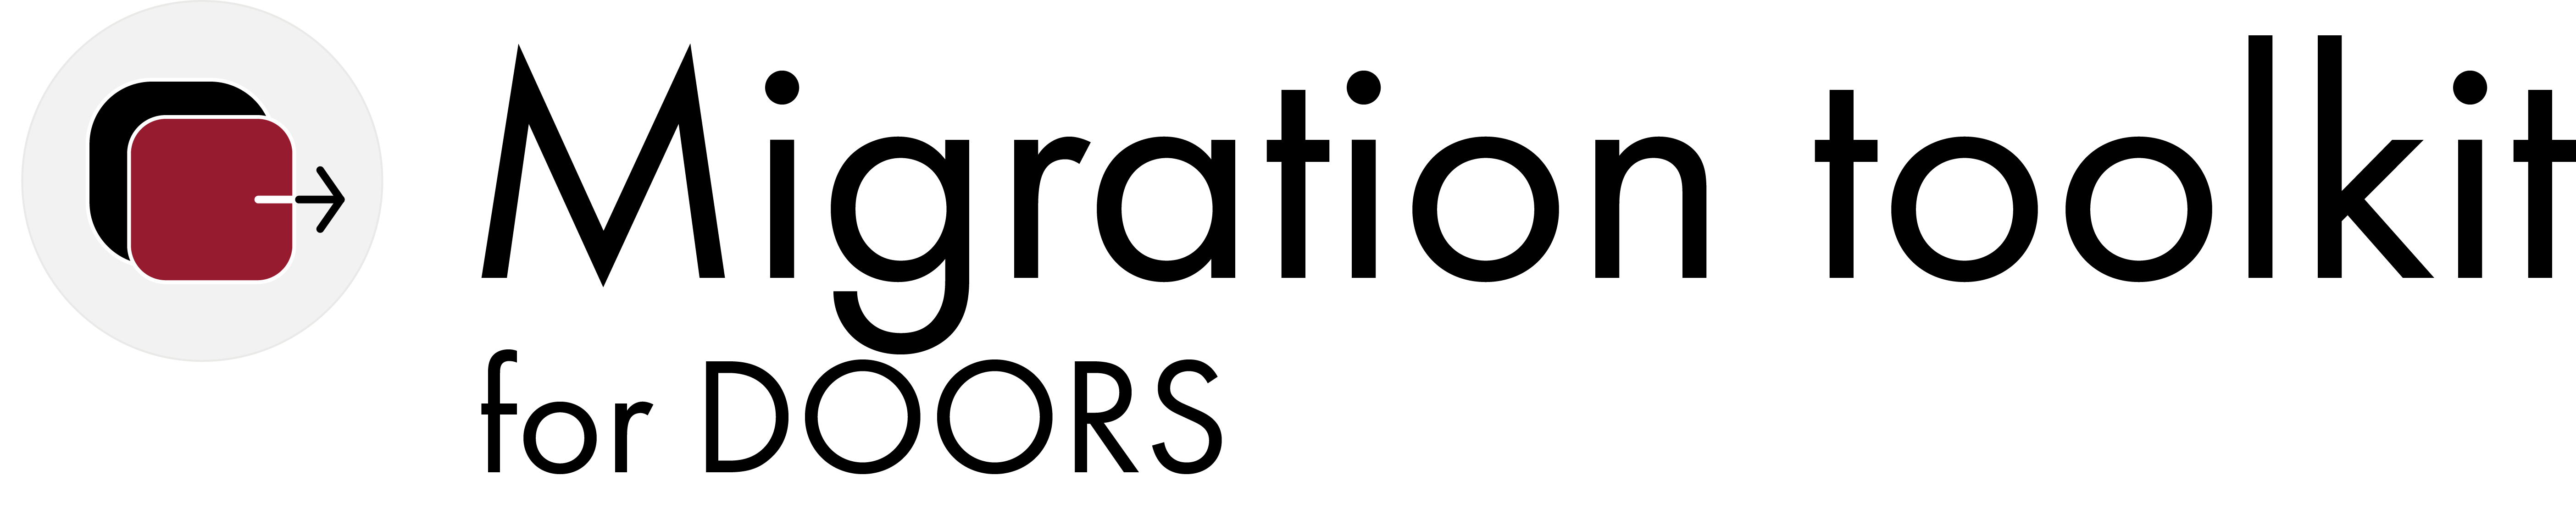 Logo_Migration toolkit for DOORS_SodiusWillert_2020_black-1